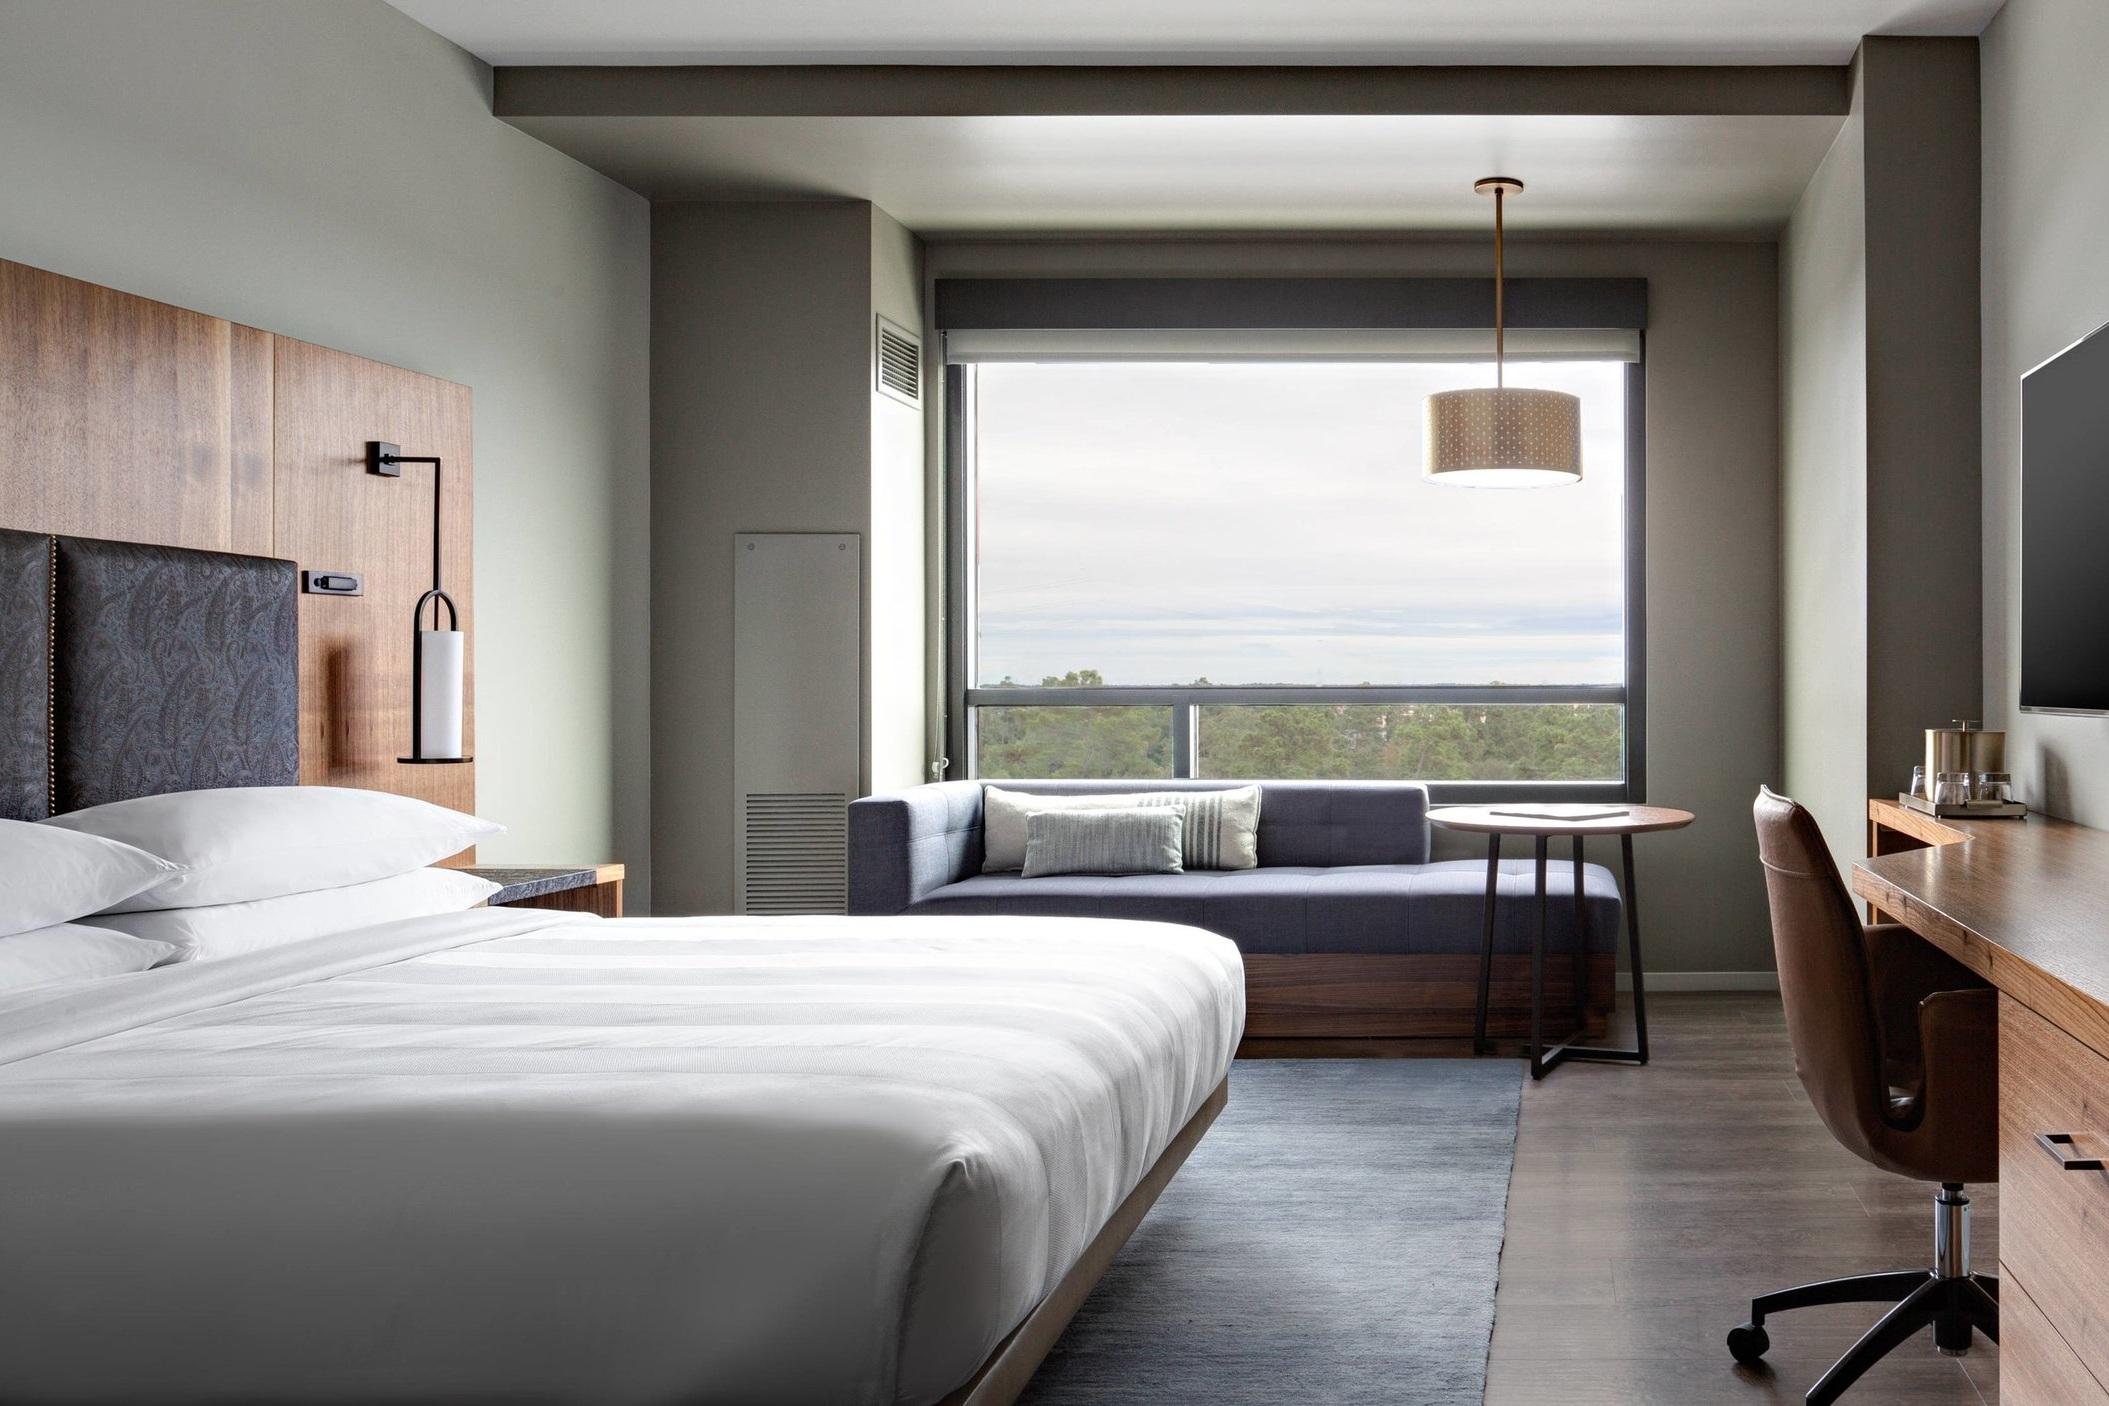 houns-guestroom-6188-hor-wide (1).jpg